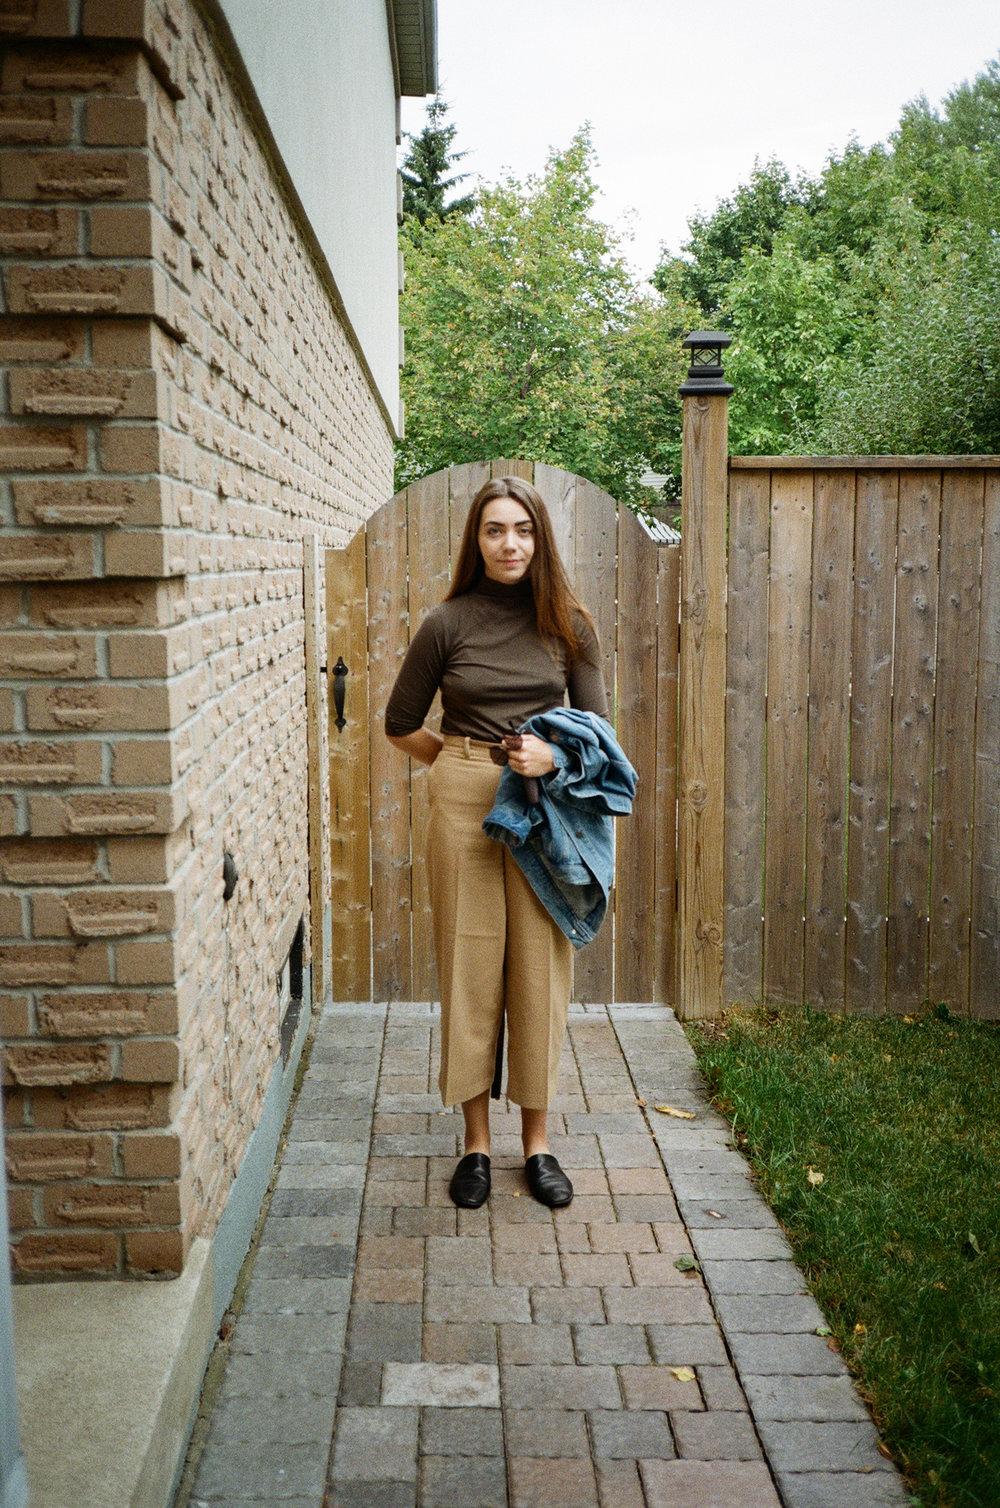 145-Ryanne-thanksgiving-fashion.jpg